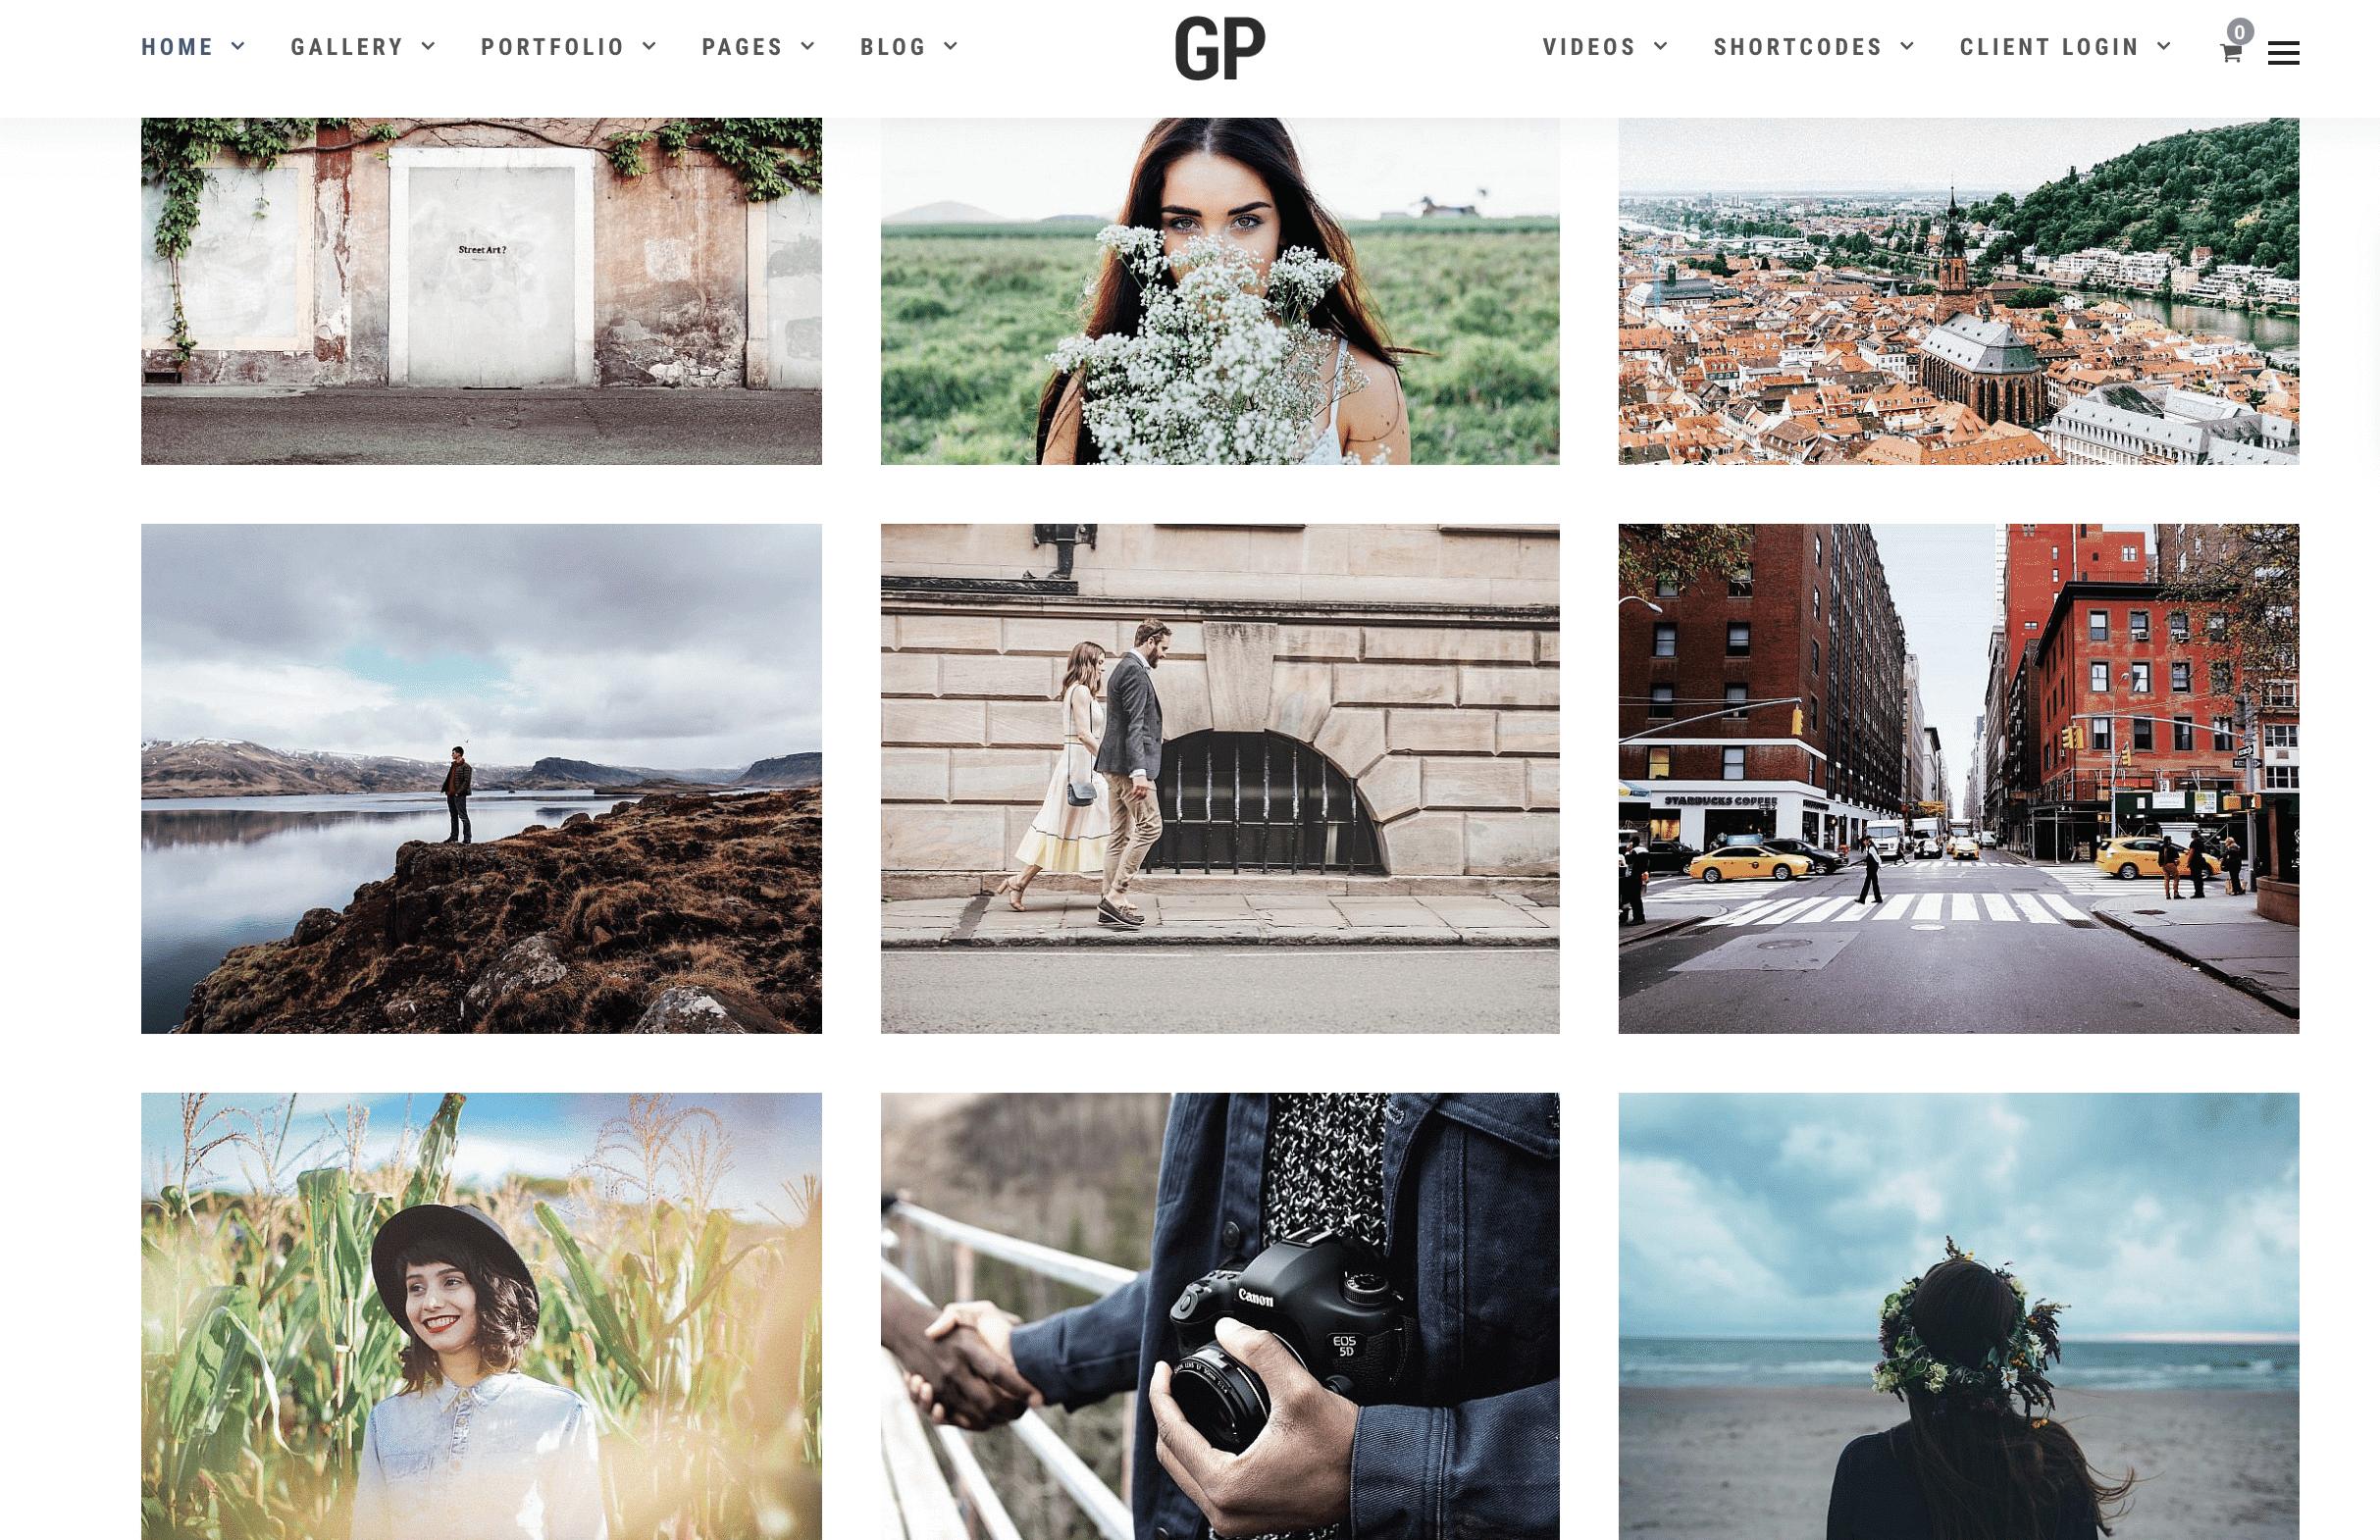 grand photography grid theme wordpress